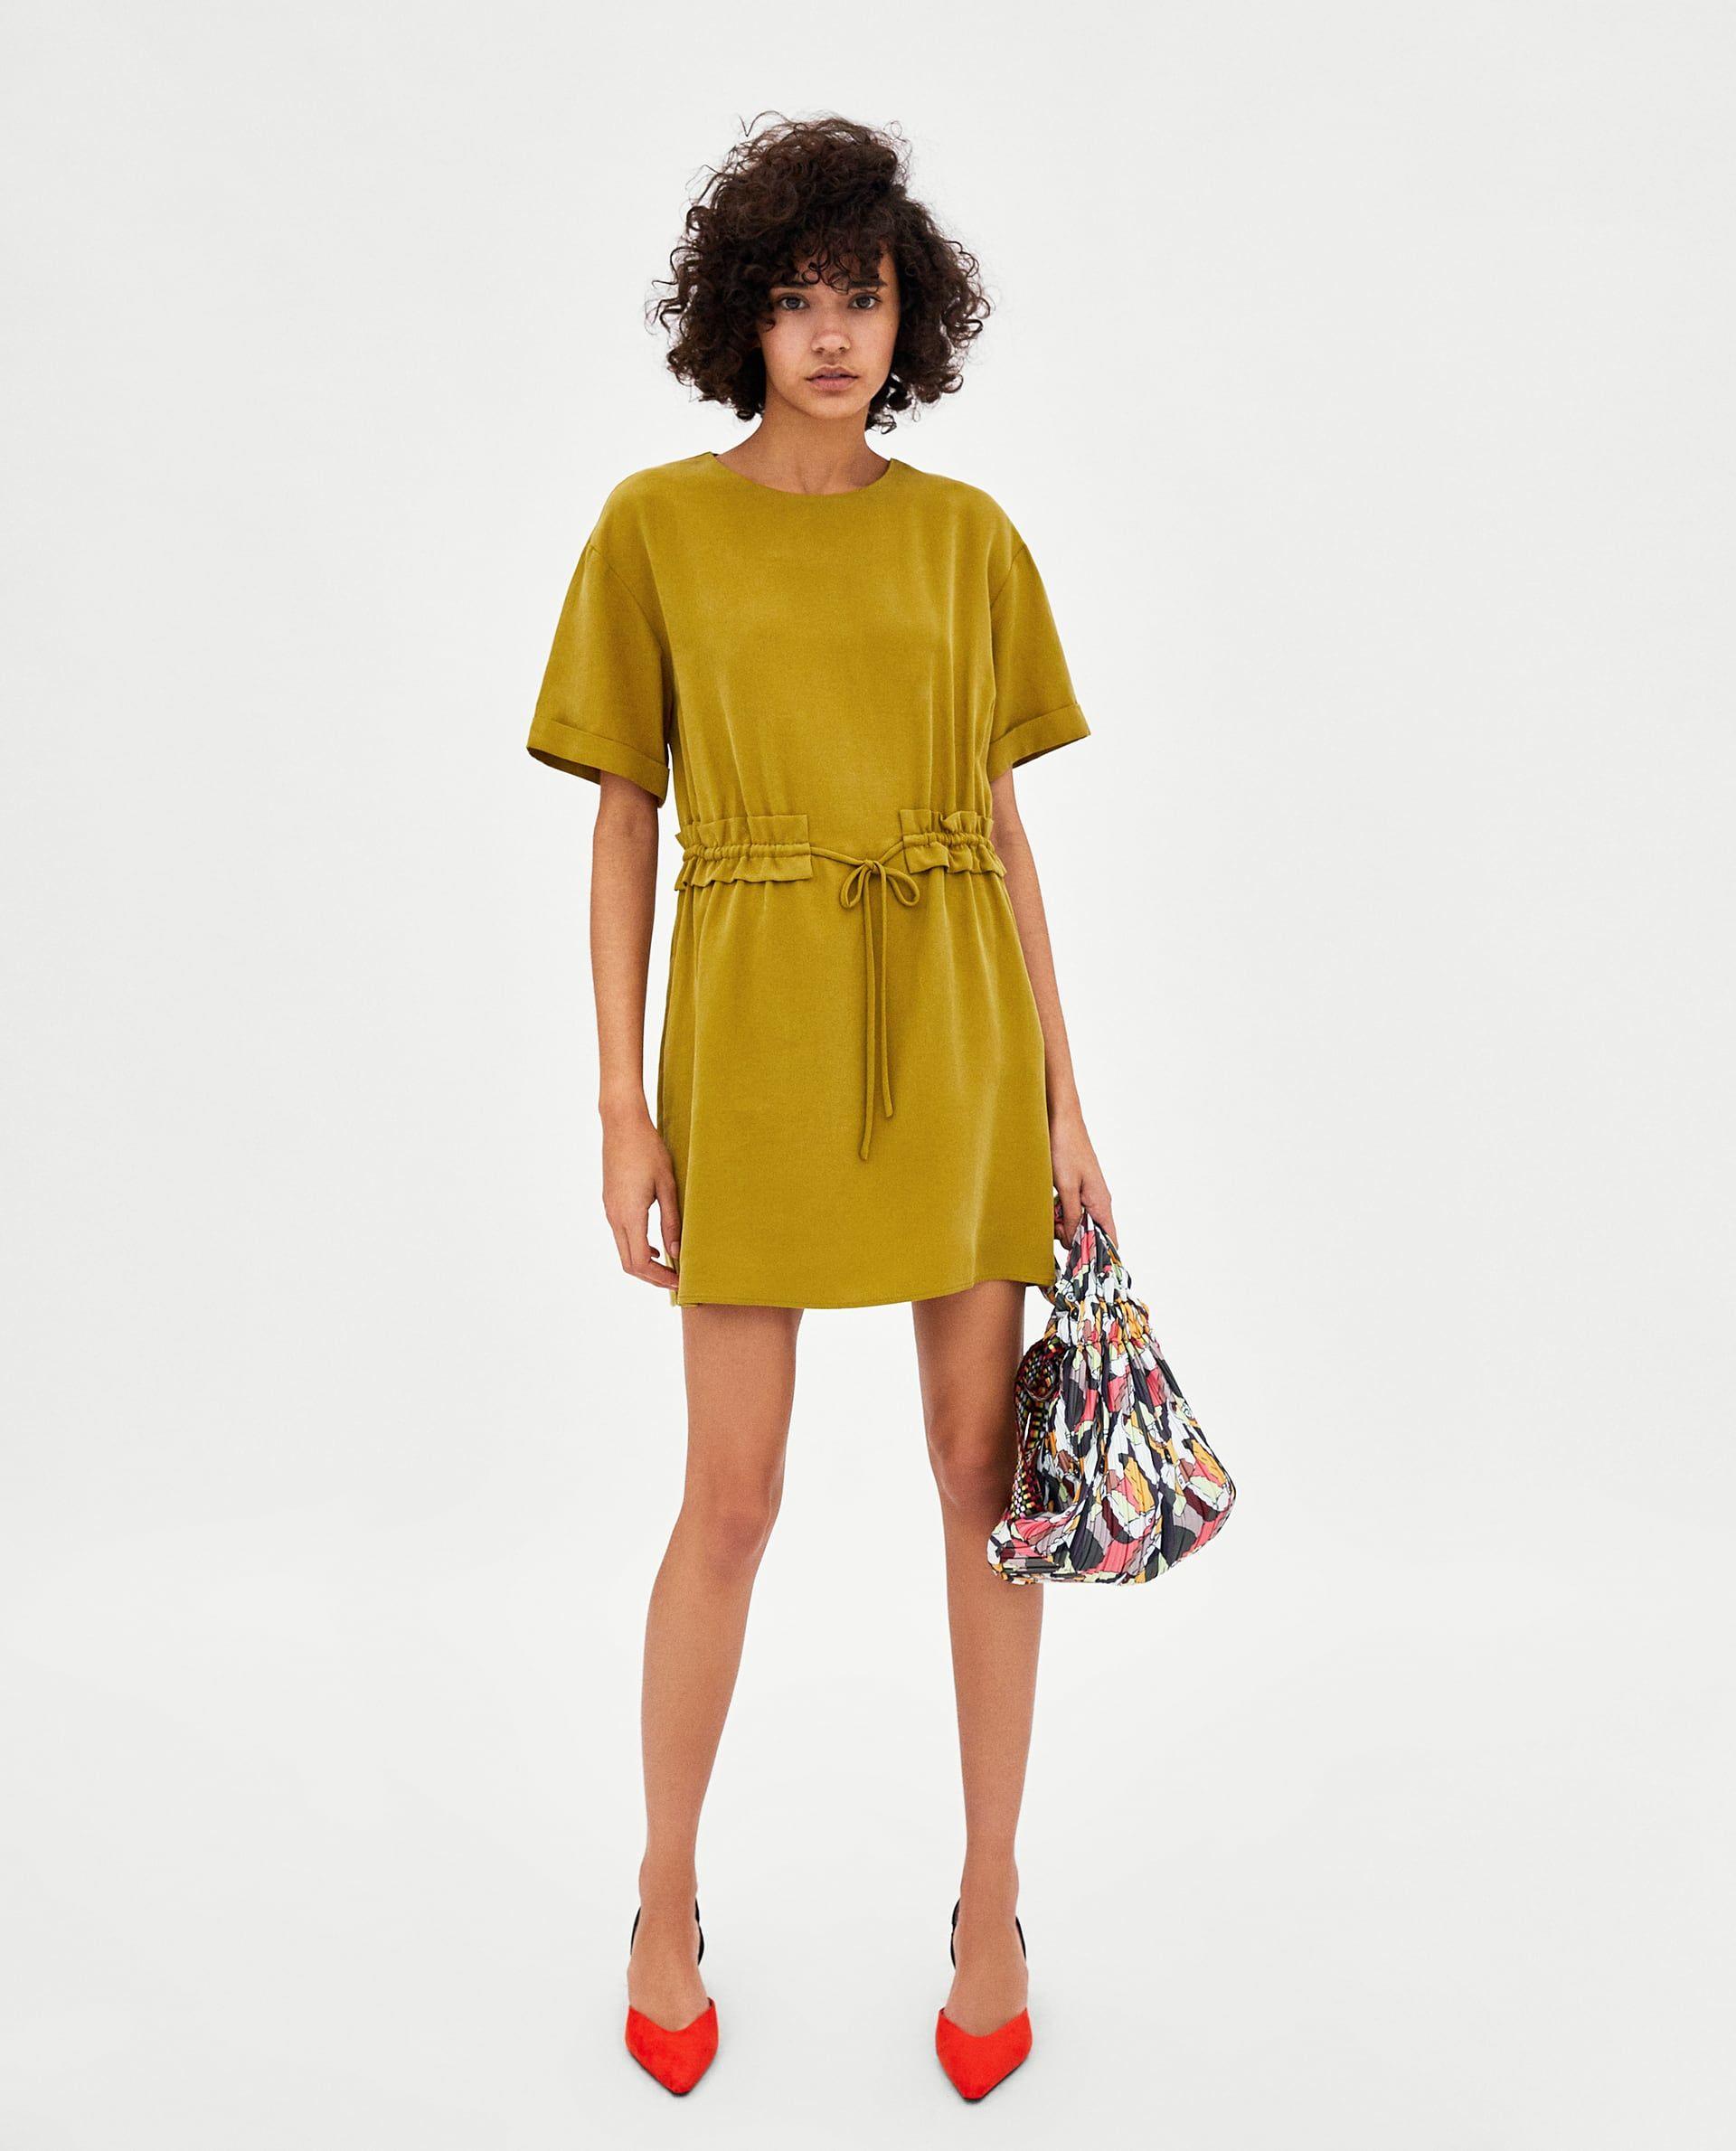 06401b45 VESTIDO FRUNCE | fall 2018 | Dresses, Fashion, Zara women